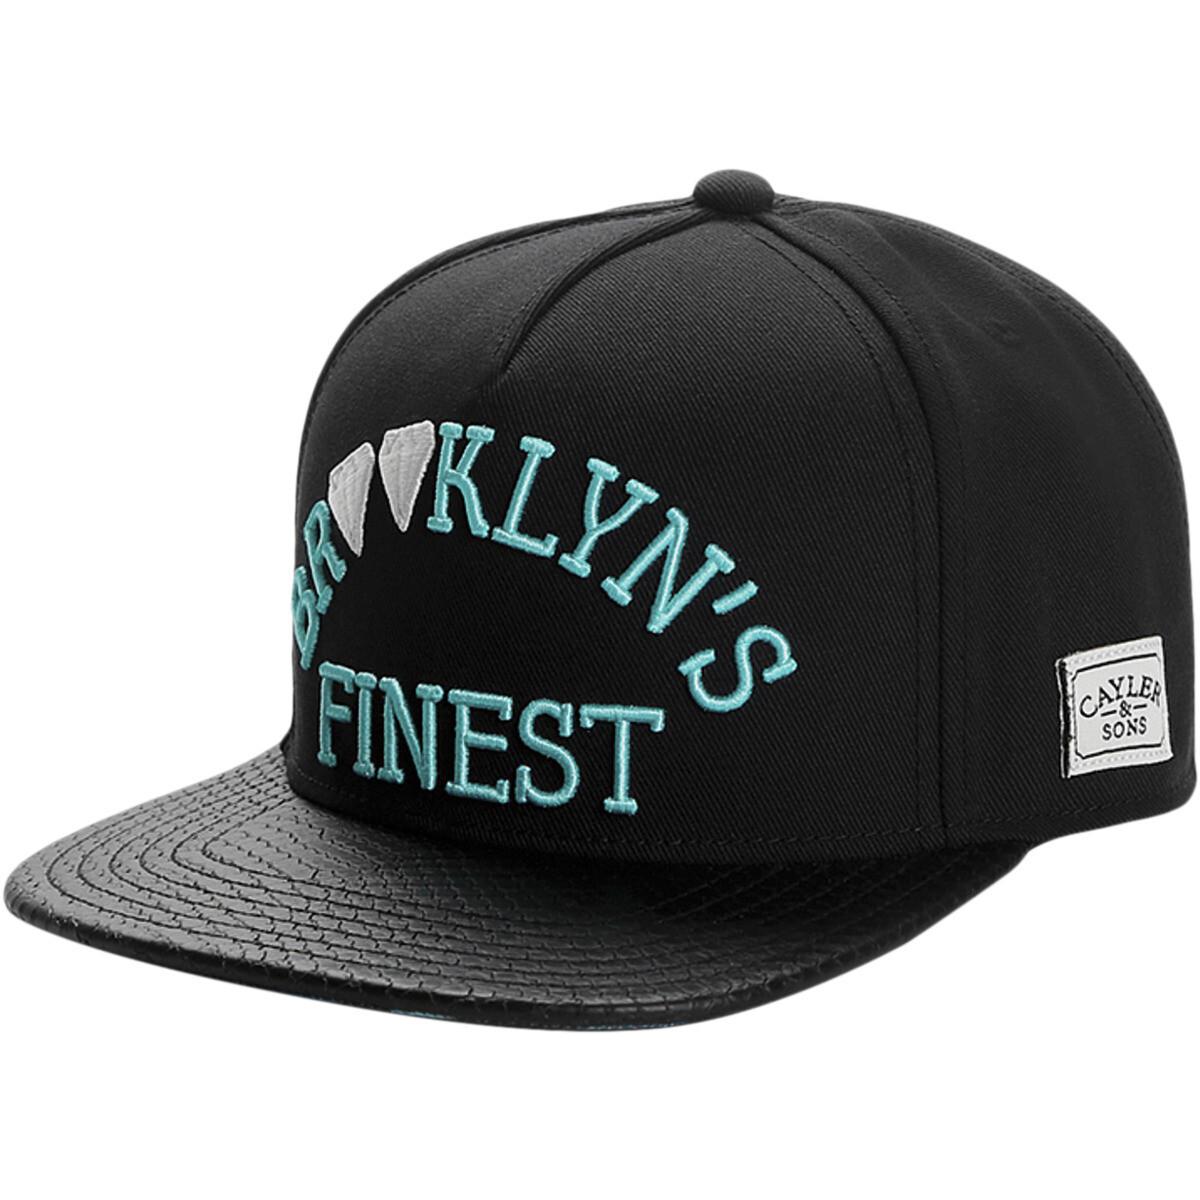 C&S WL BK's Finest Cap